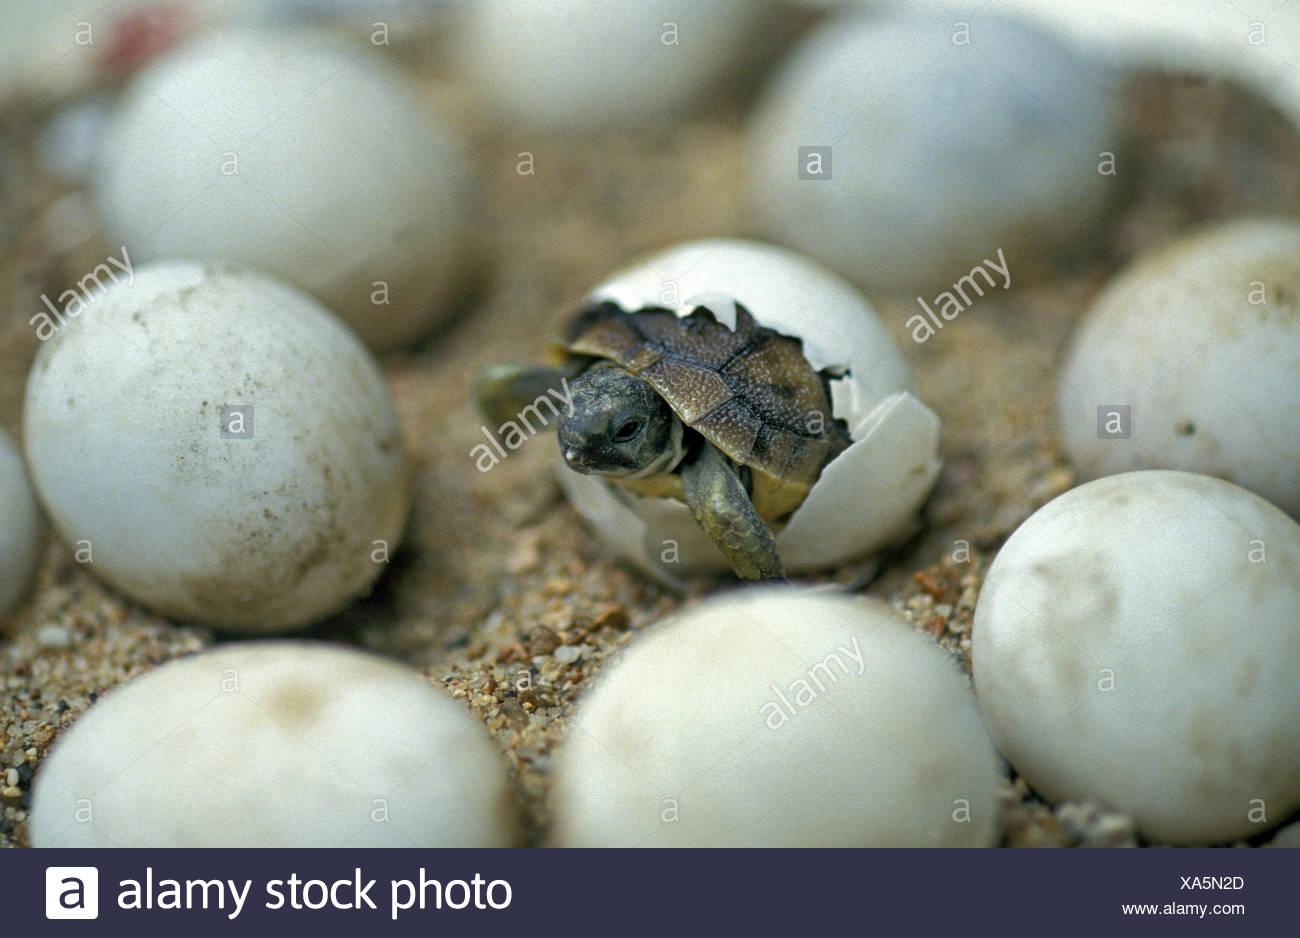 Hermann's Tortoise, testudo hermanni, Baby Hatching from Egg - Stock Image